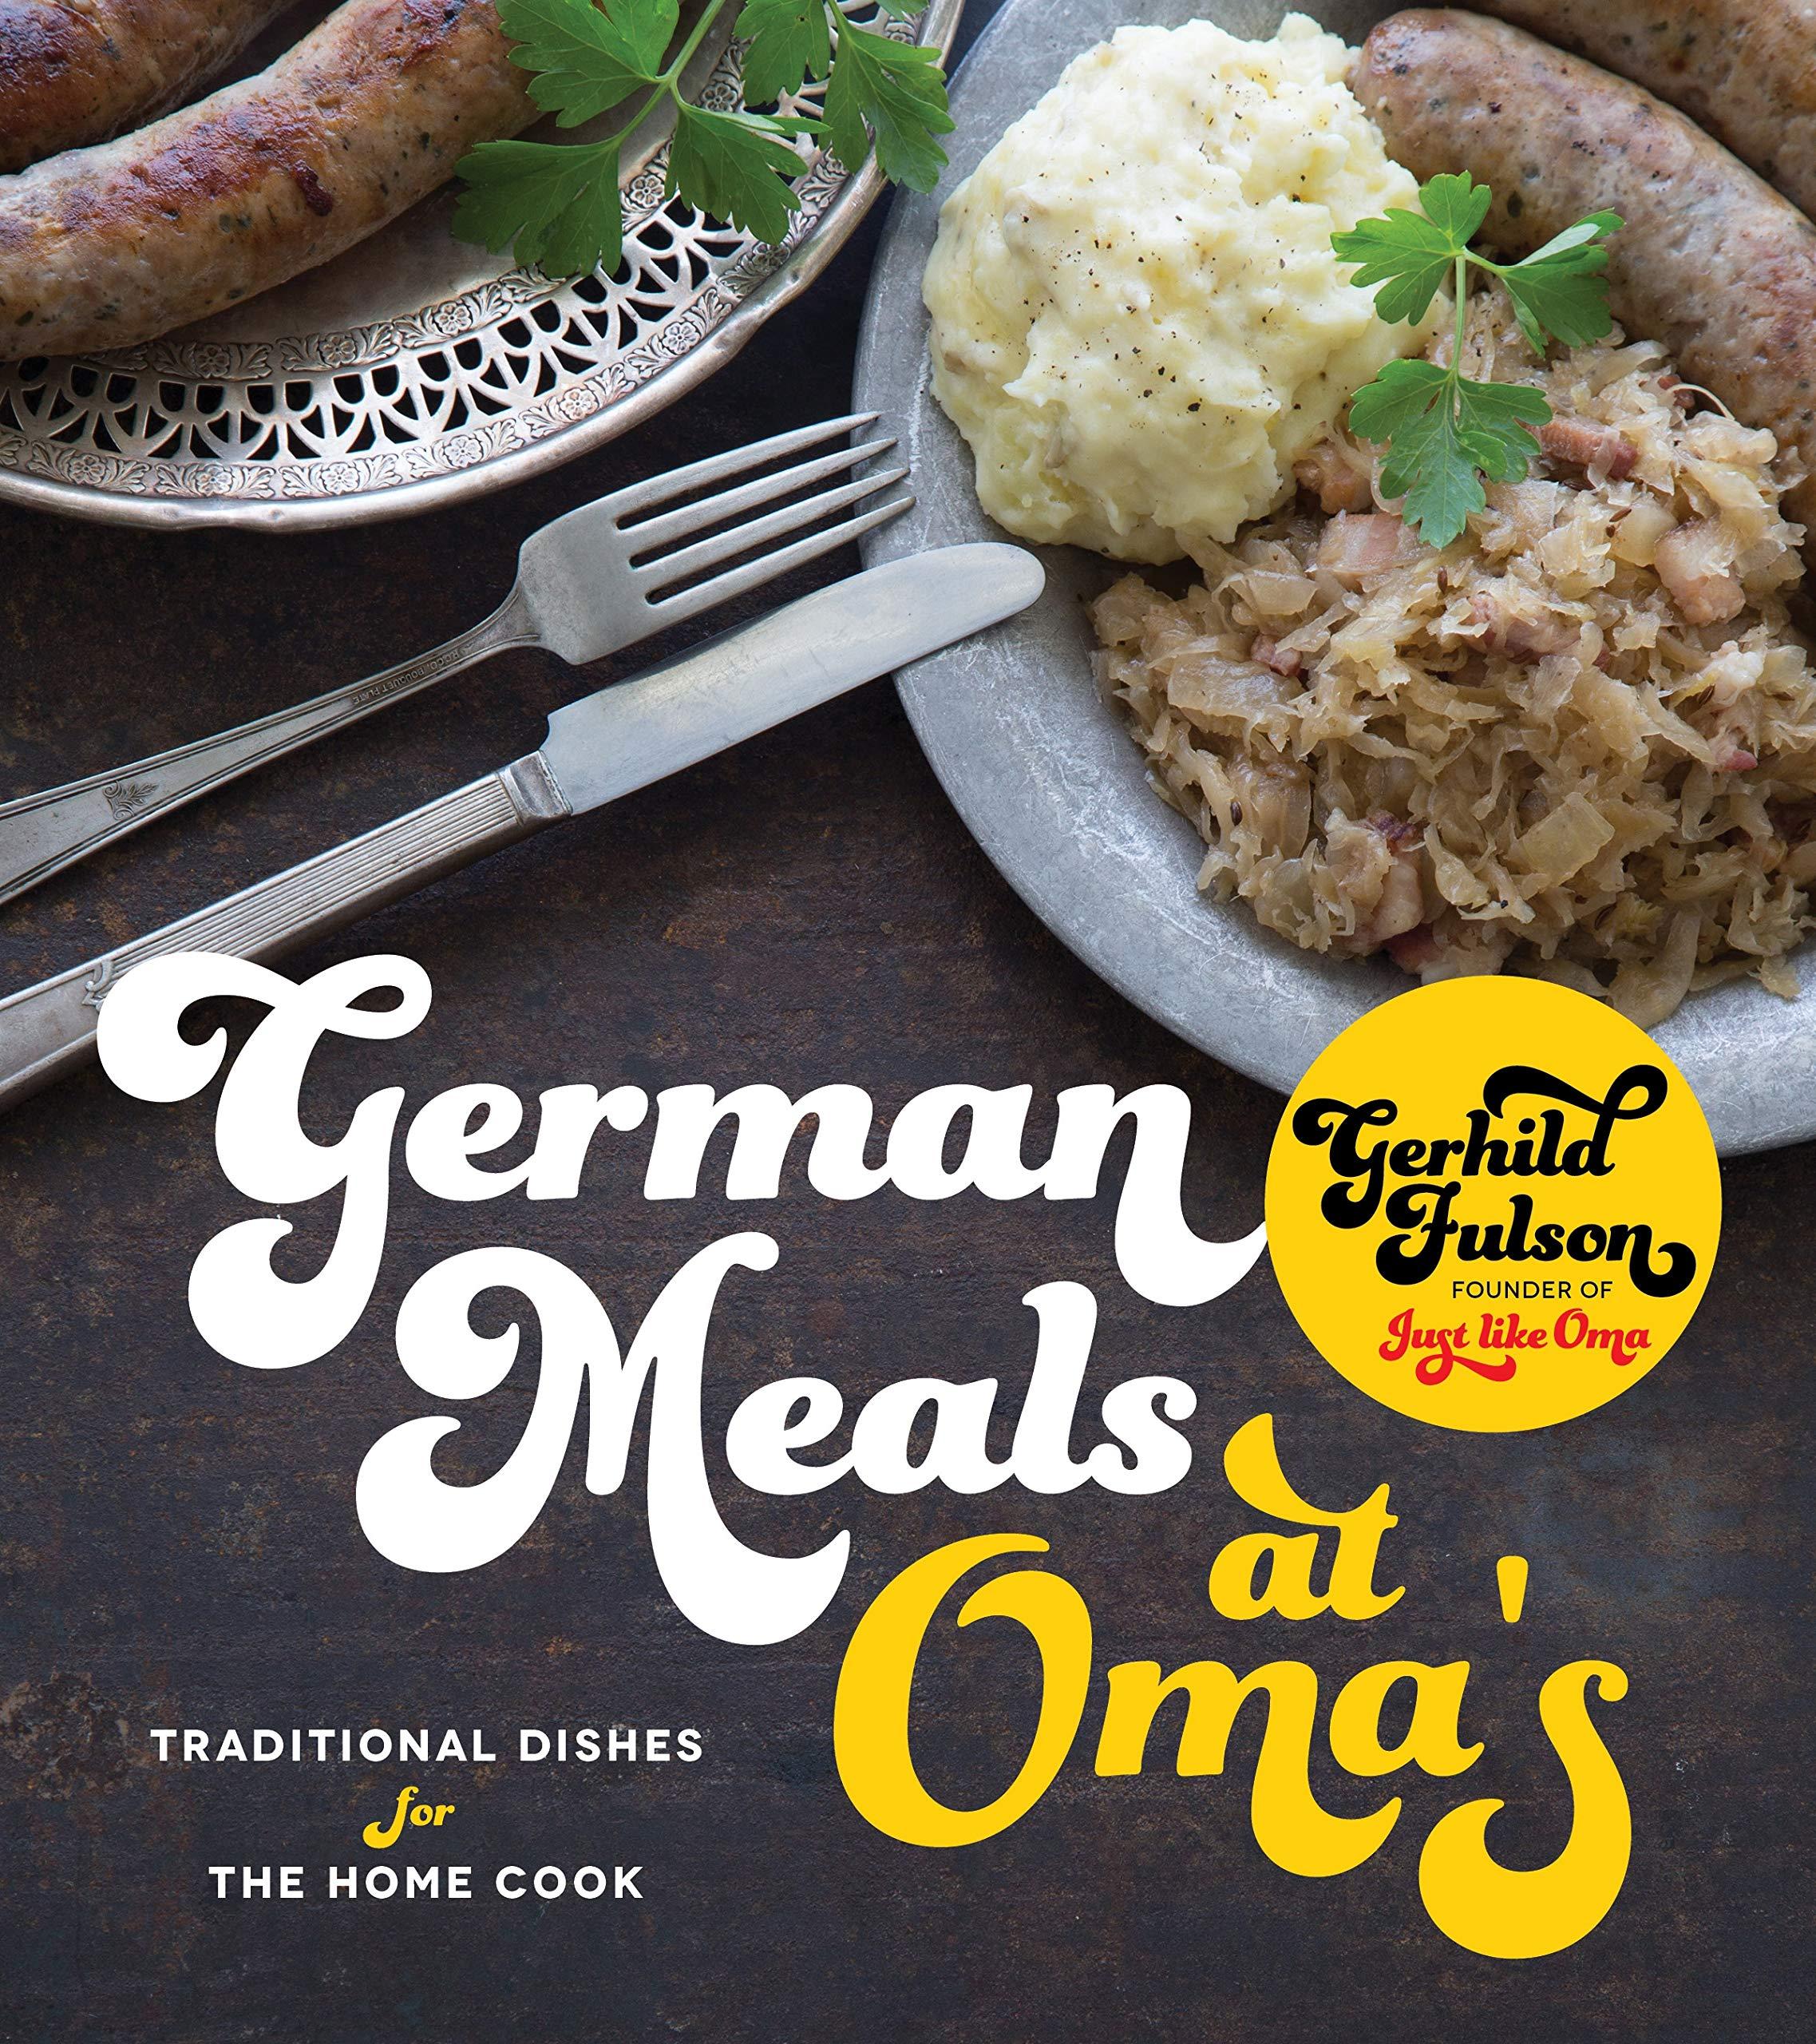 German Couple Recipe Box